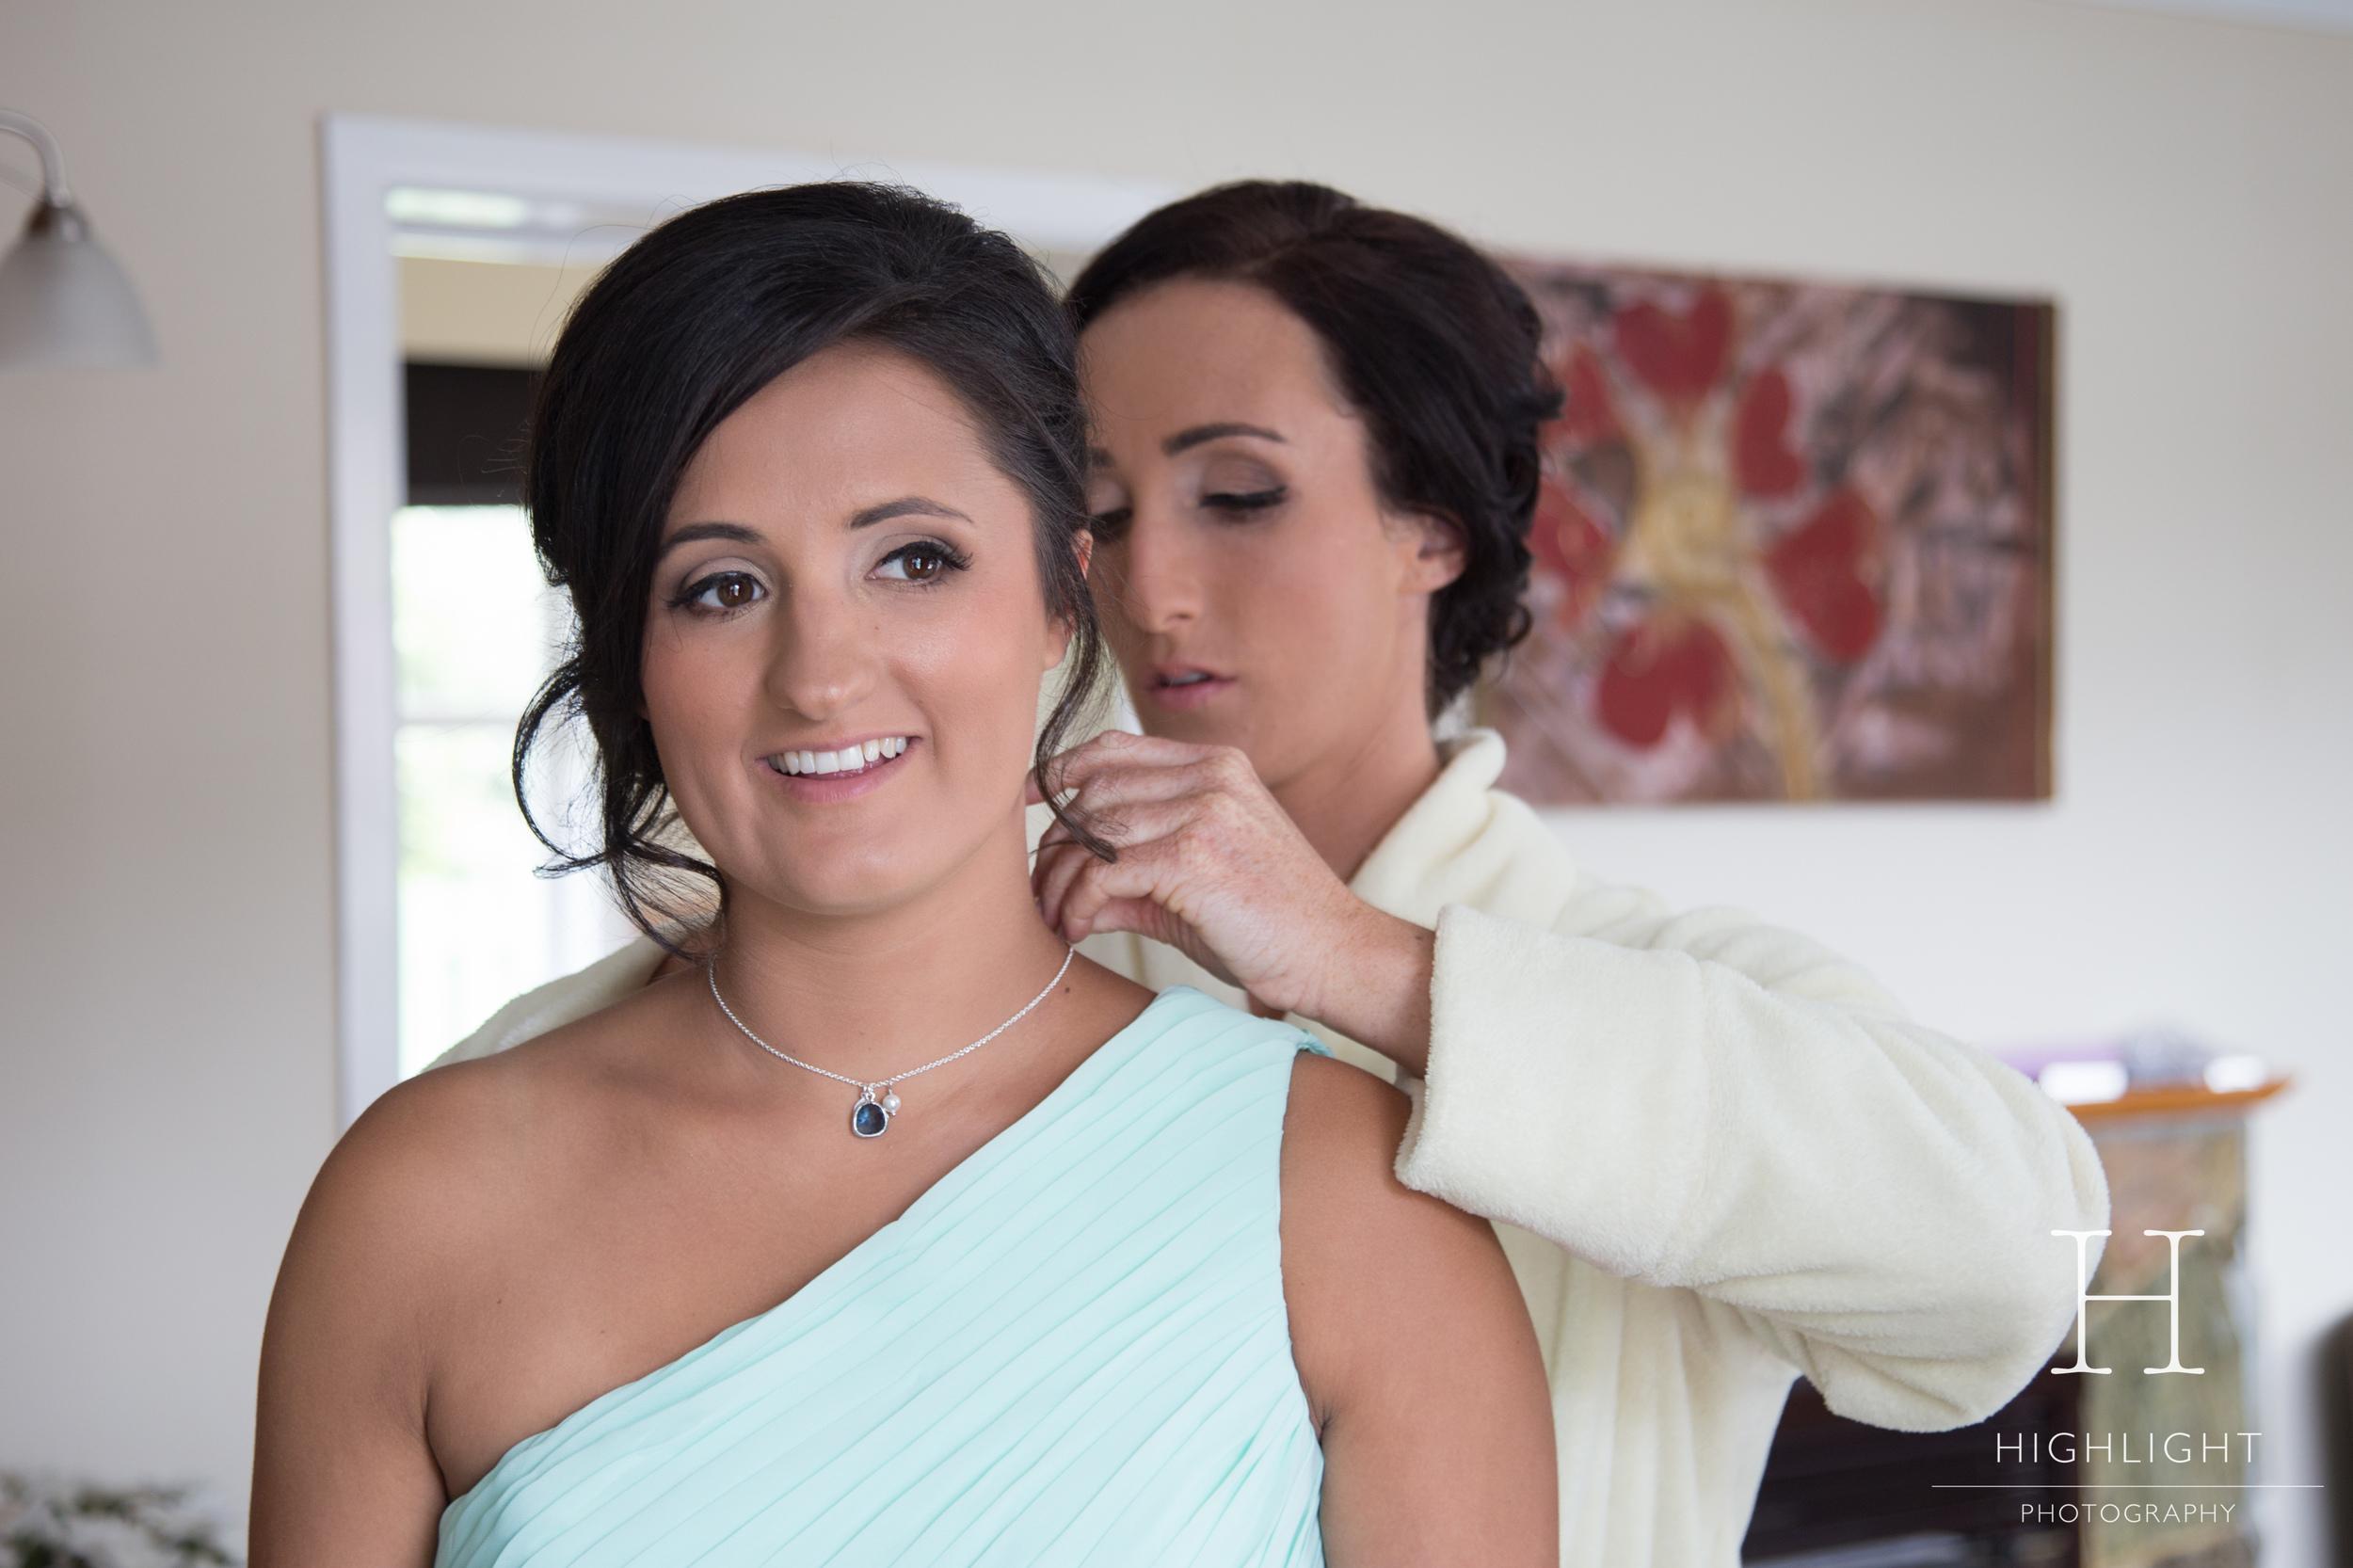 highlight_photography_wedding_new_zealand_necklace.jpg